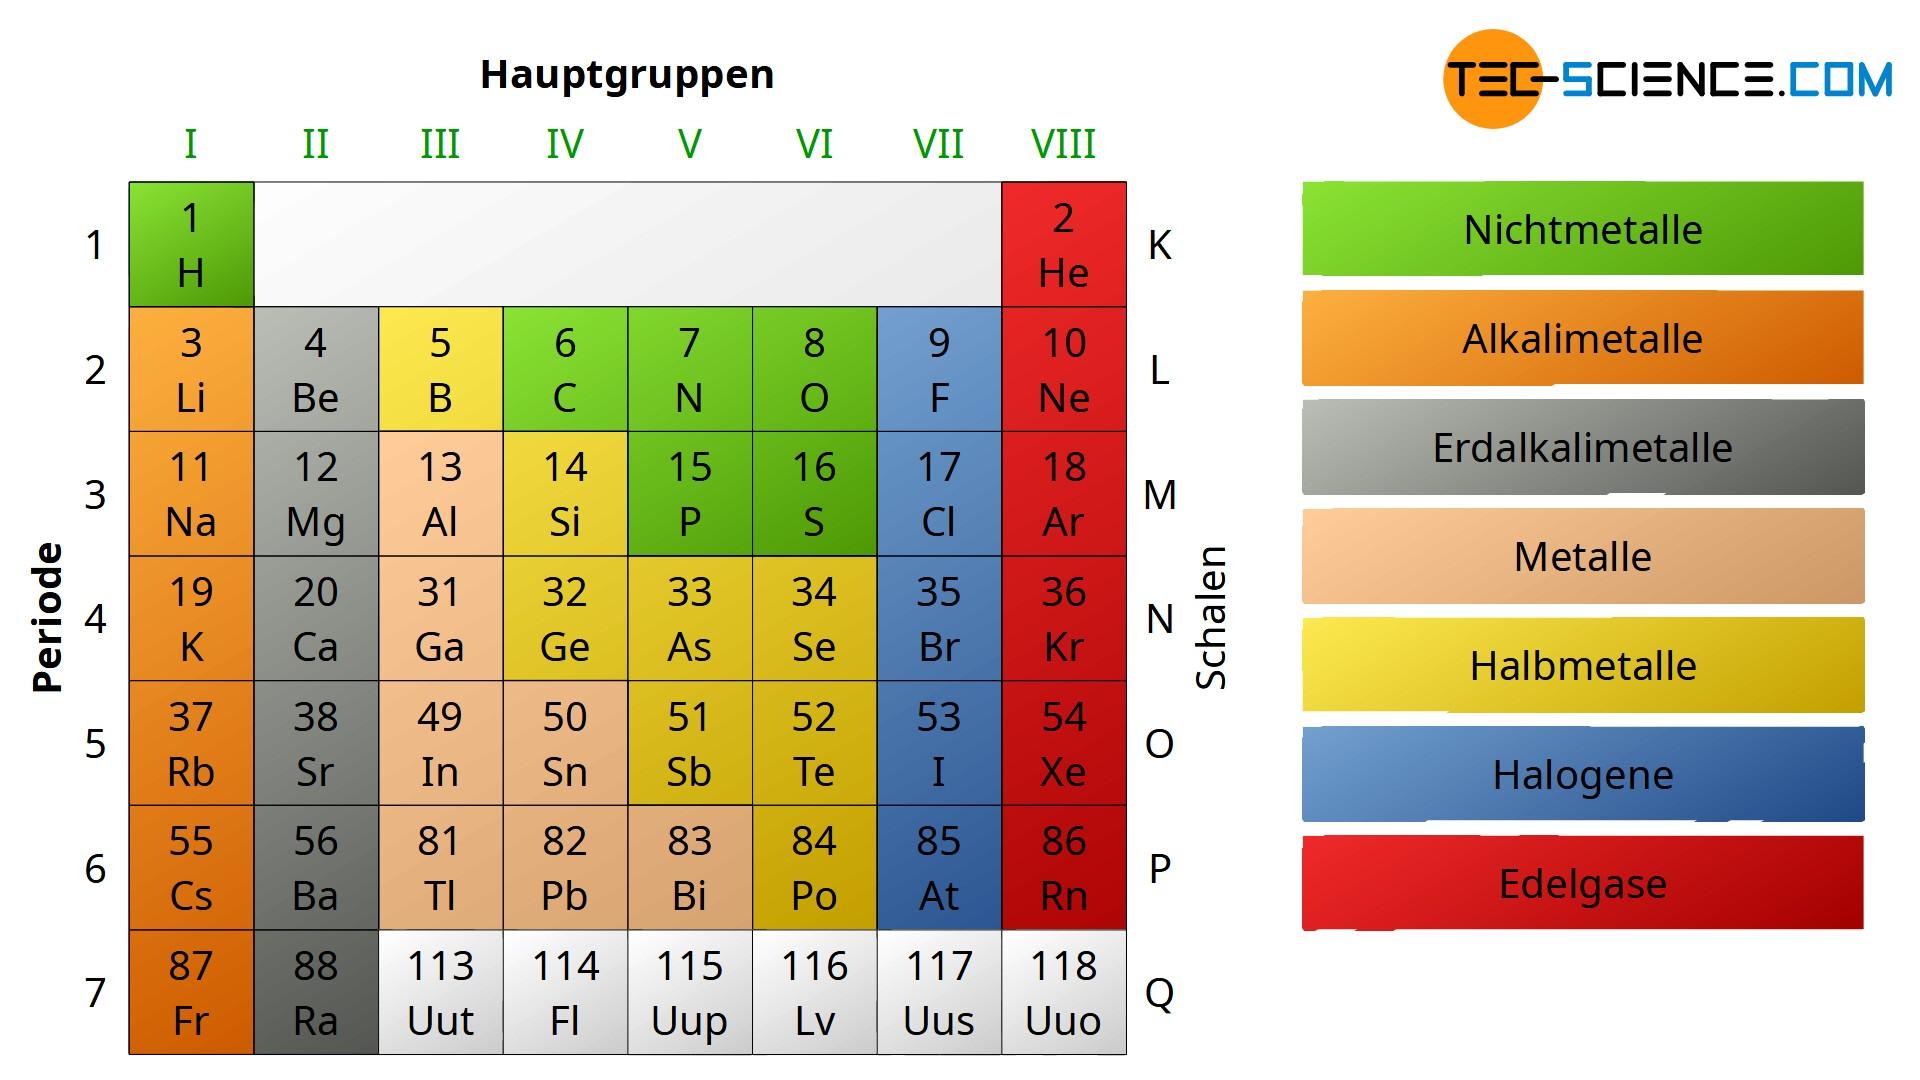 Hauptgruppe im Periodensystem